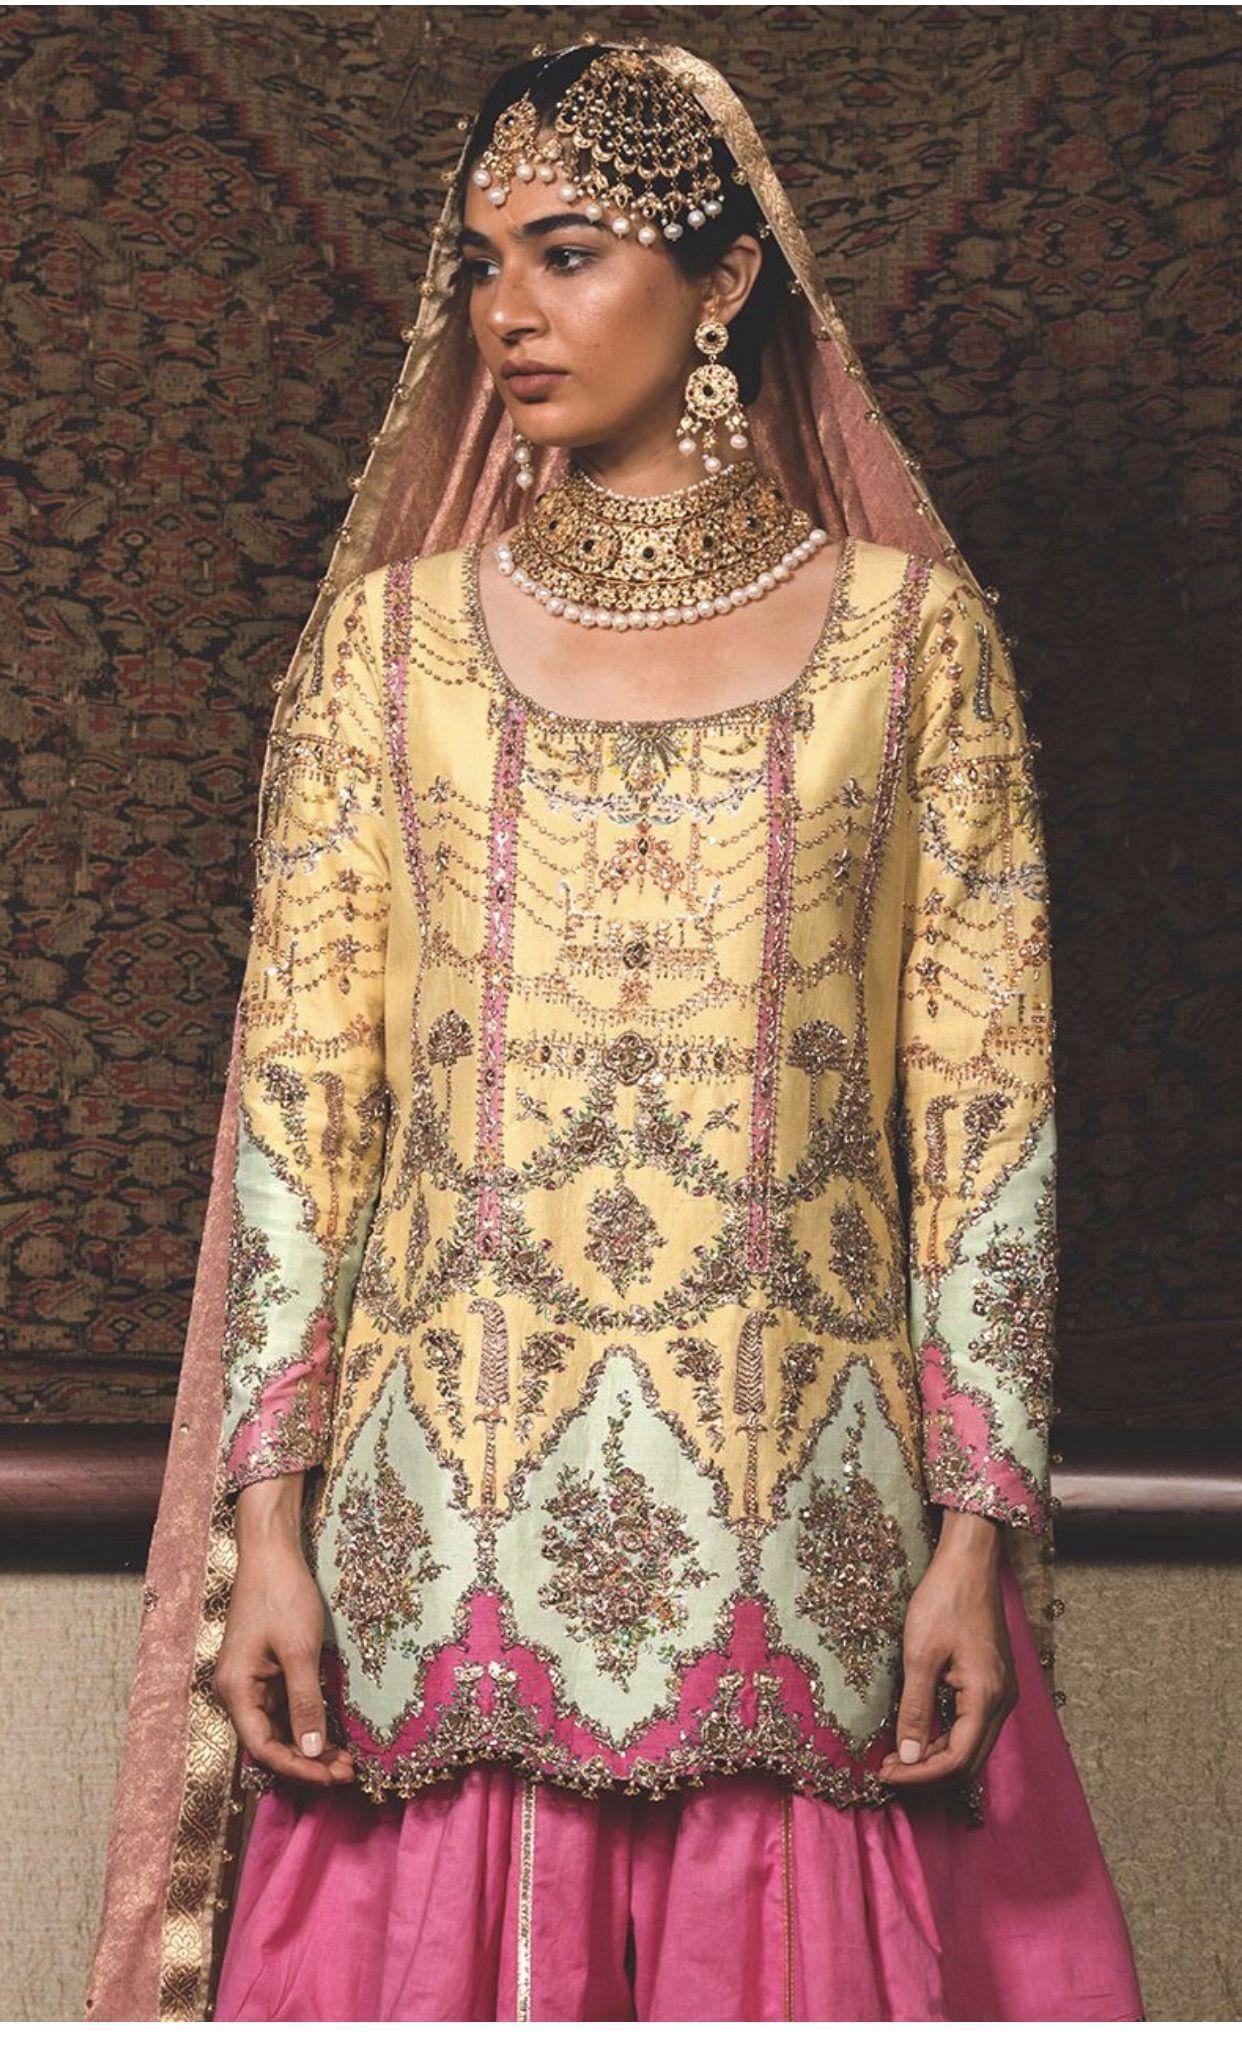 Rajput wedding dress  Pin by divya rajput on d  Pinterest  Pakistani Indian clothes and